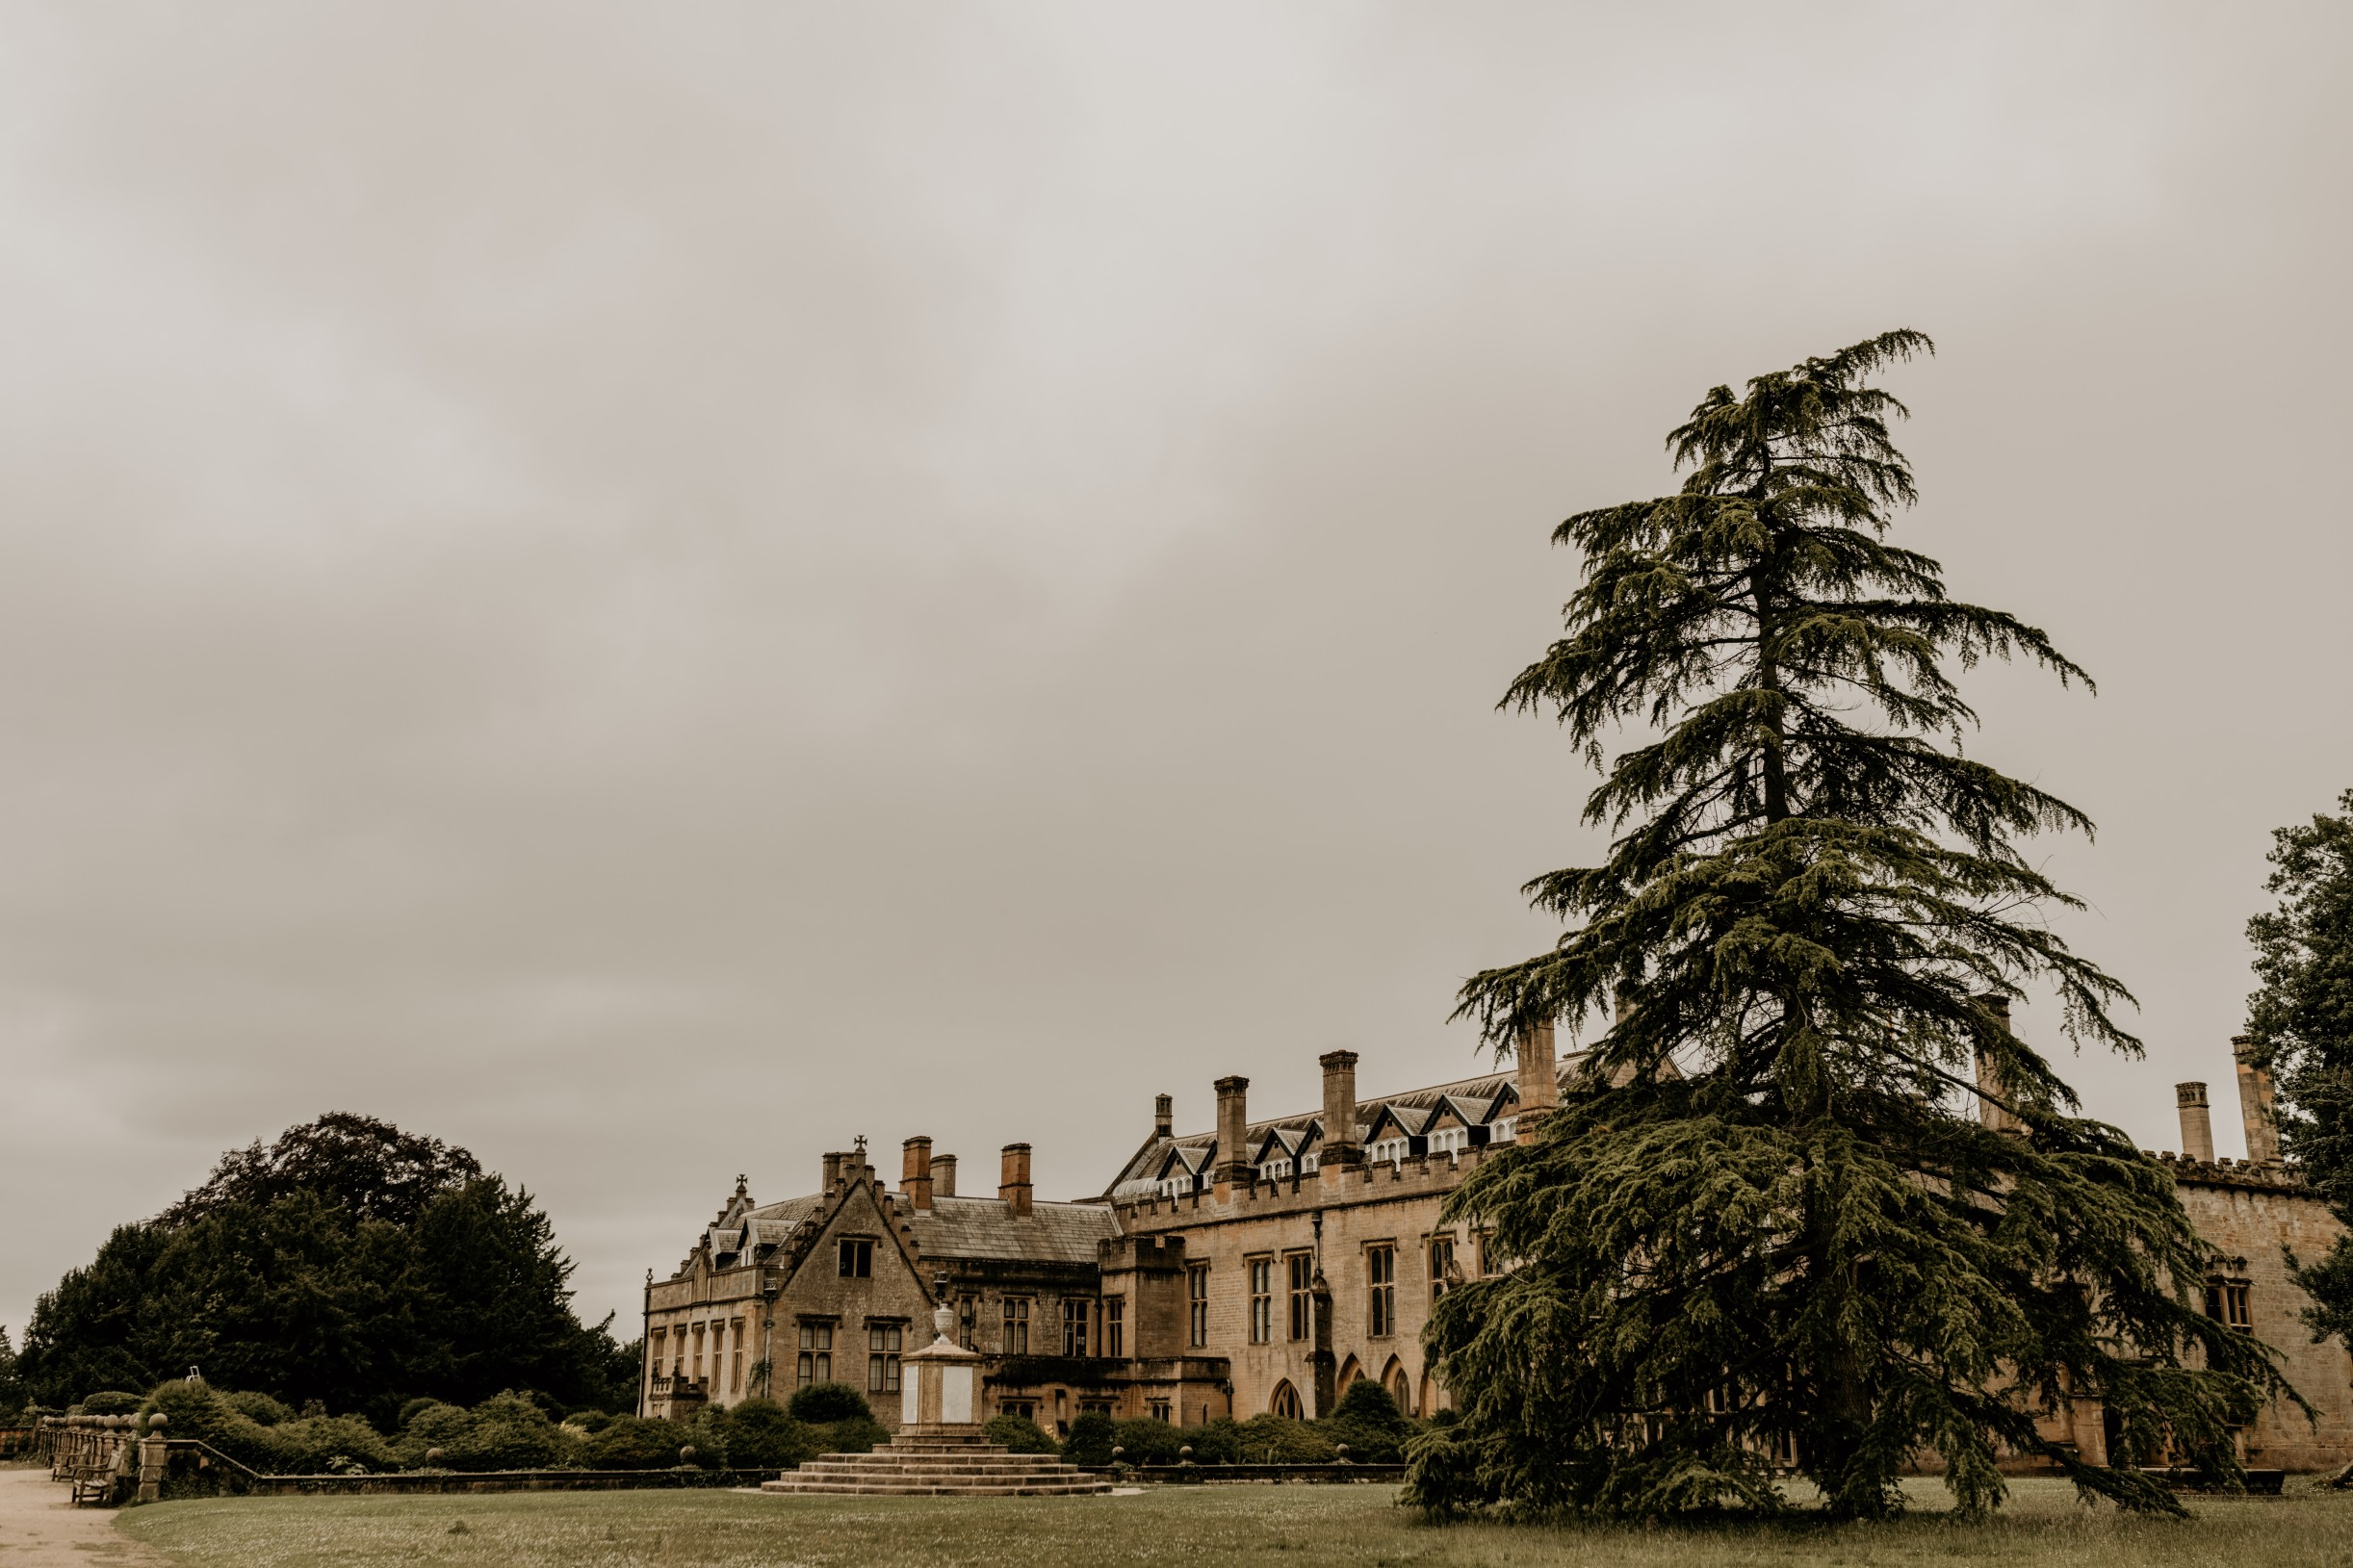 country garden wedding at newstead abbey - unconventional wedding - nottinghamshire wedding venue